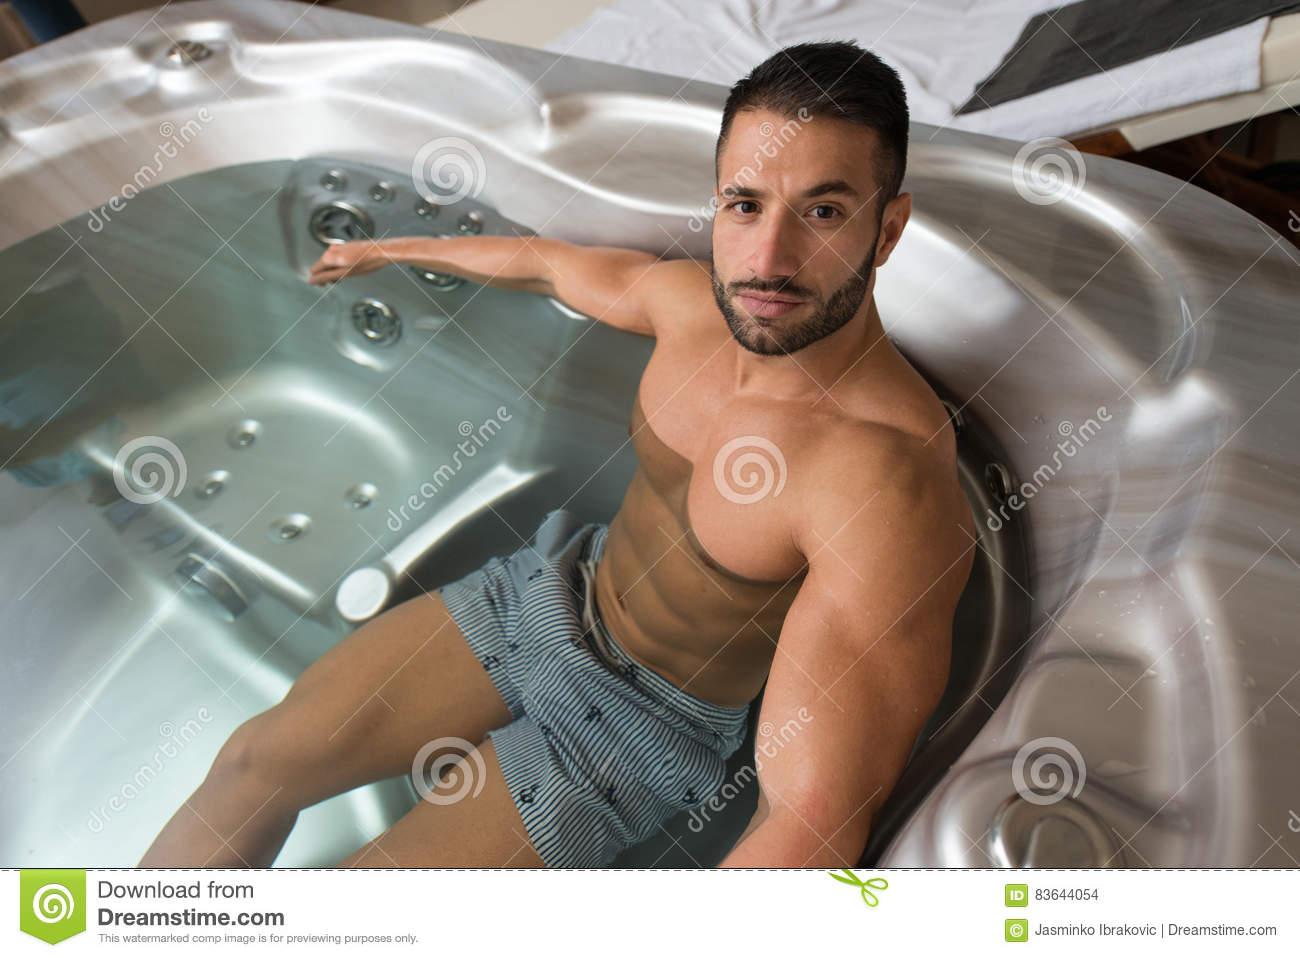 relaxing hot tube jacuzzi wellness spa man tub whirlpool indoors luxury resort spa retreat